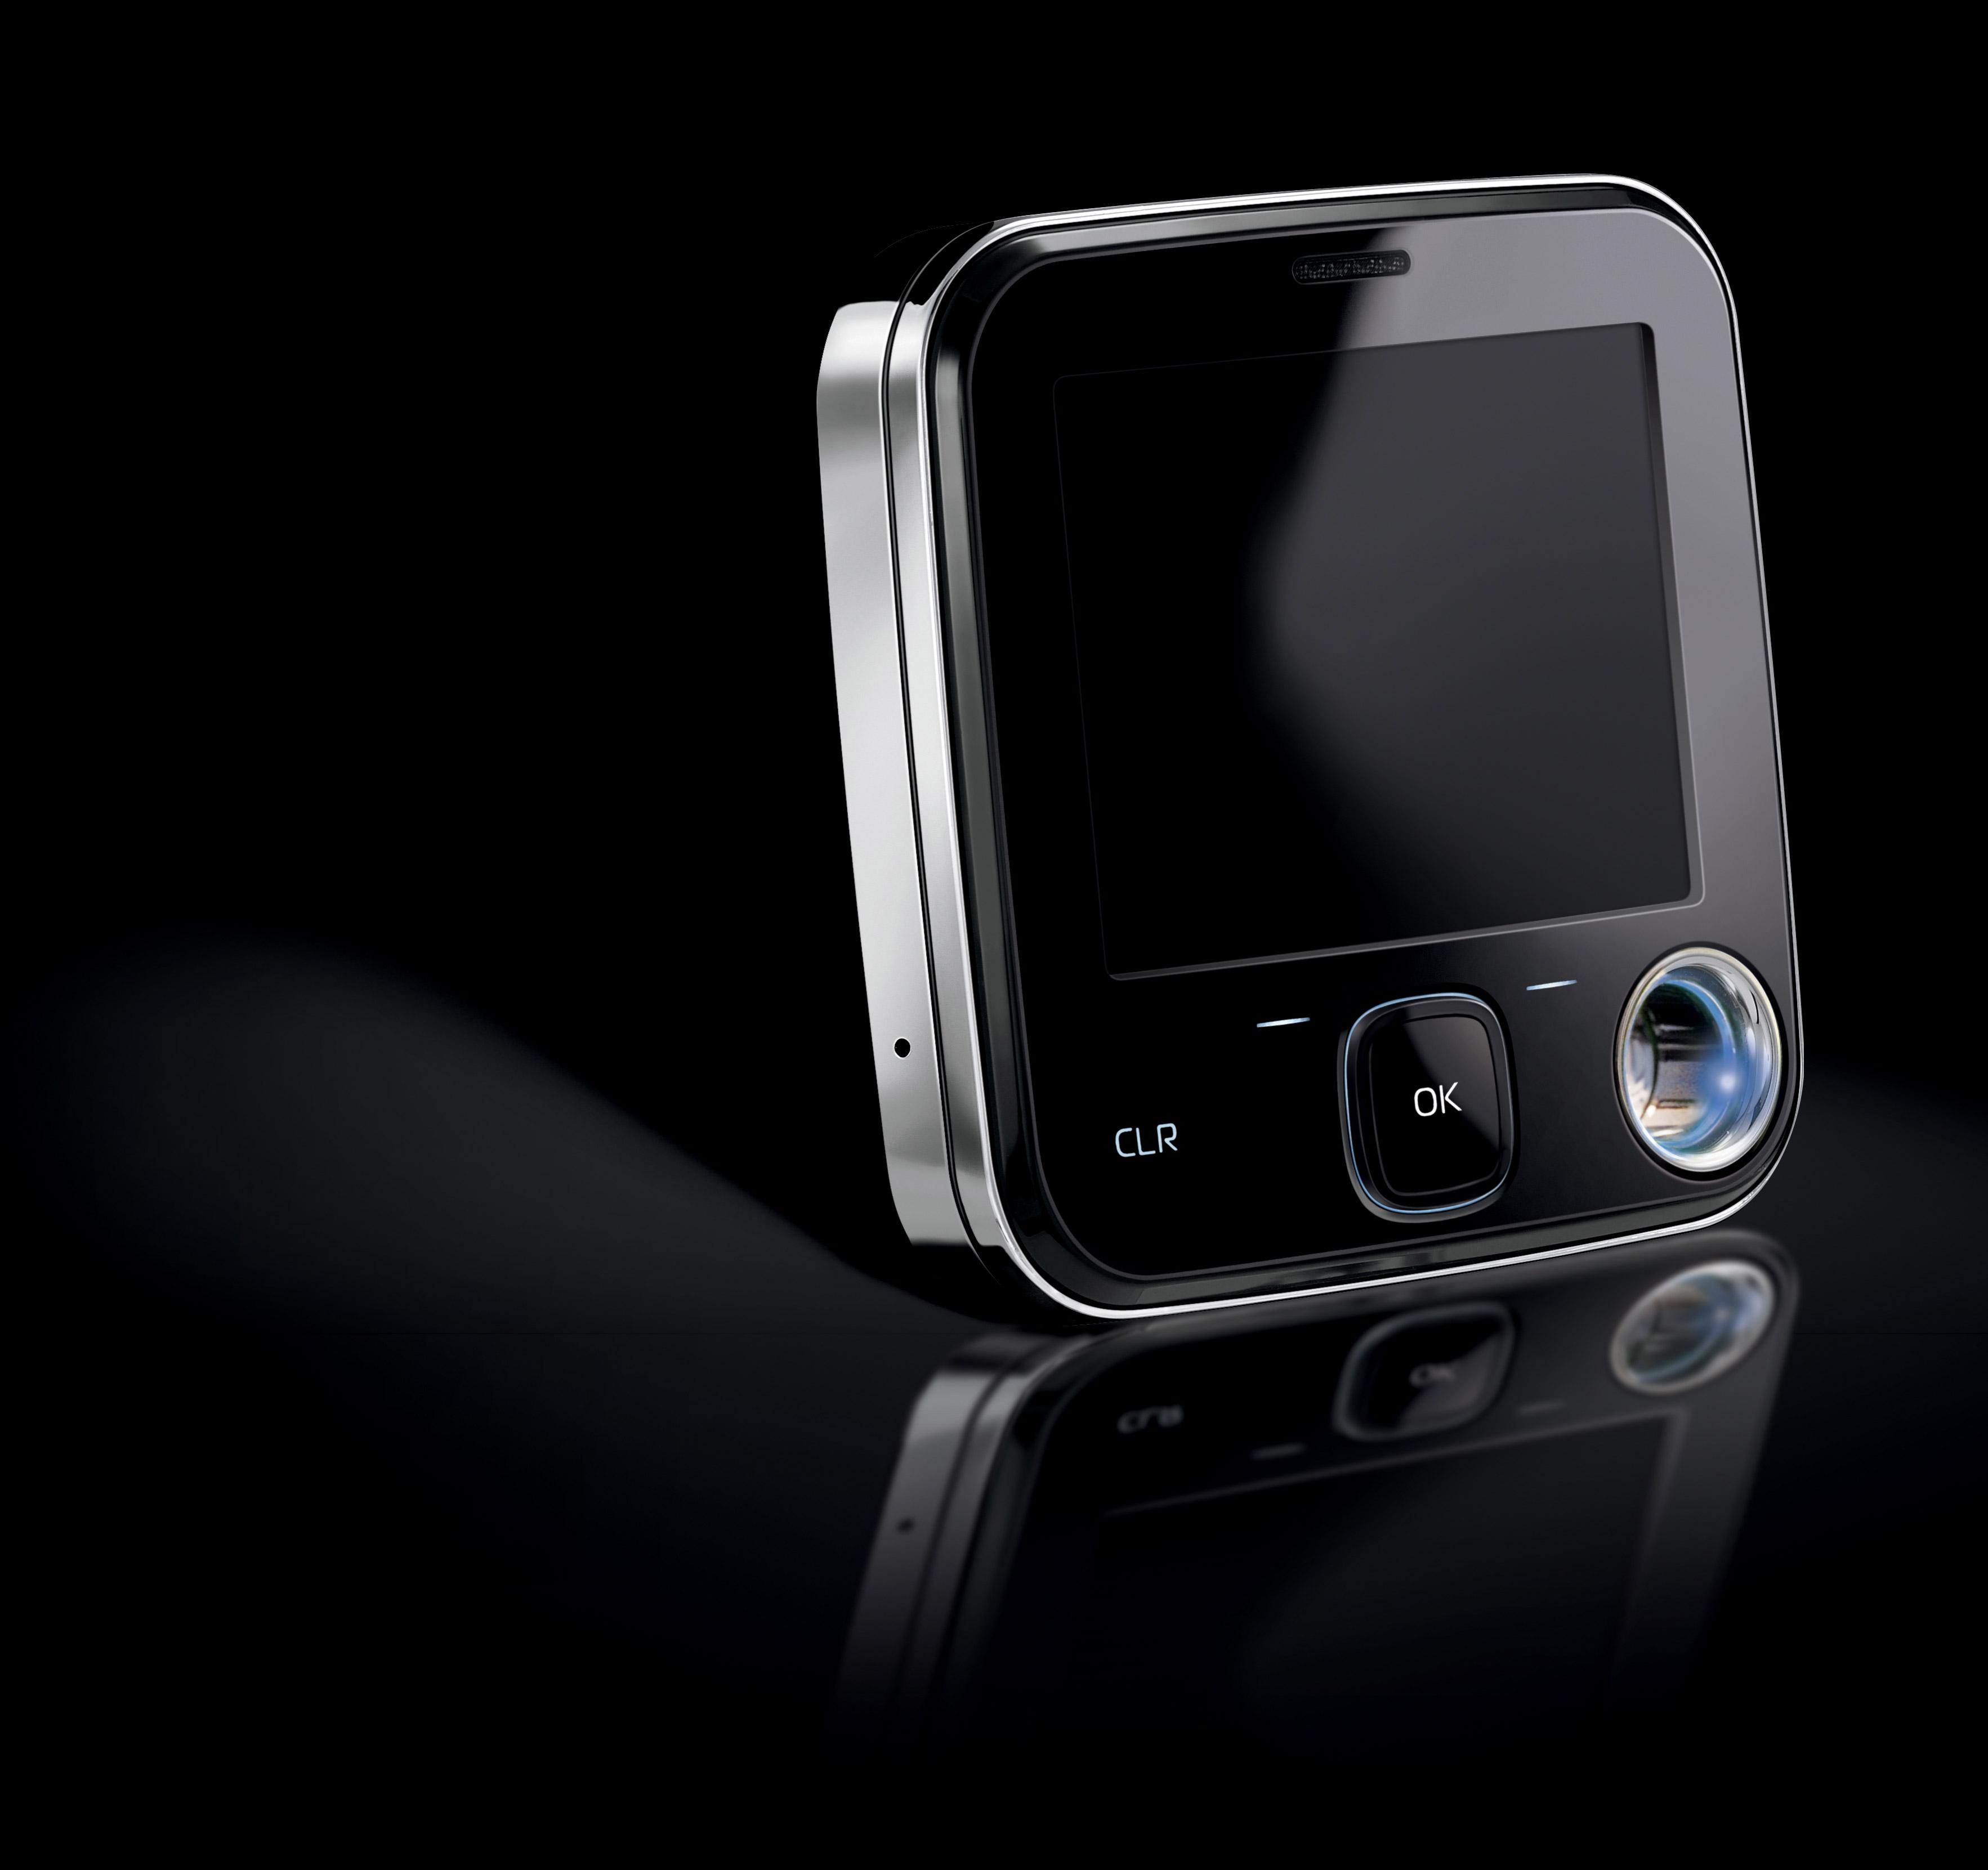 Nokia_7705_Twist_Glam_Blue